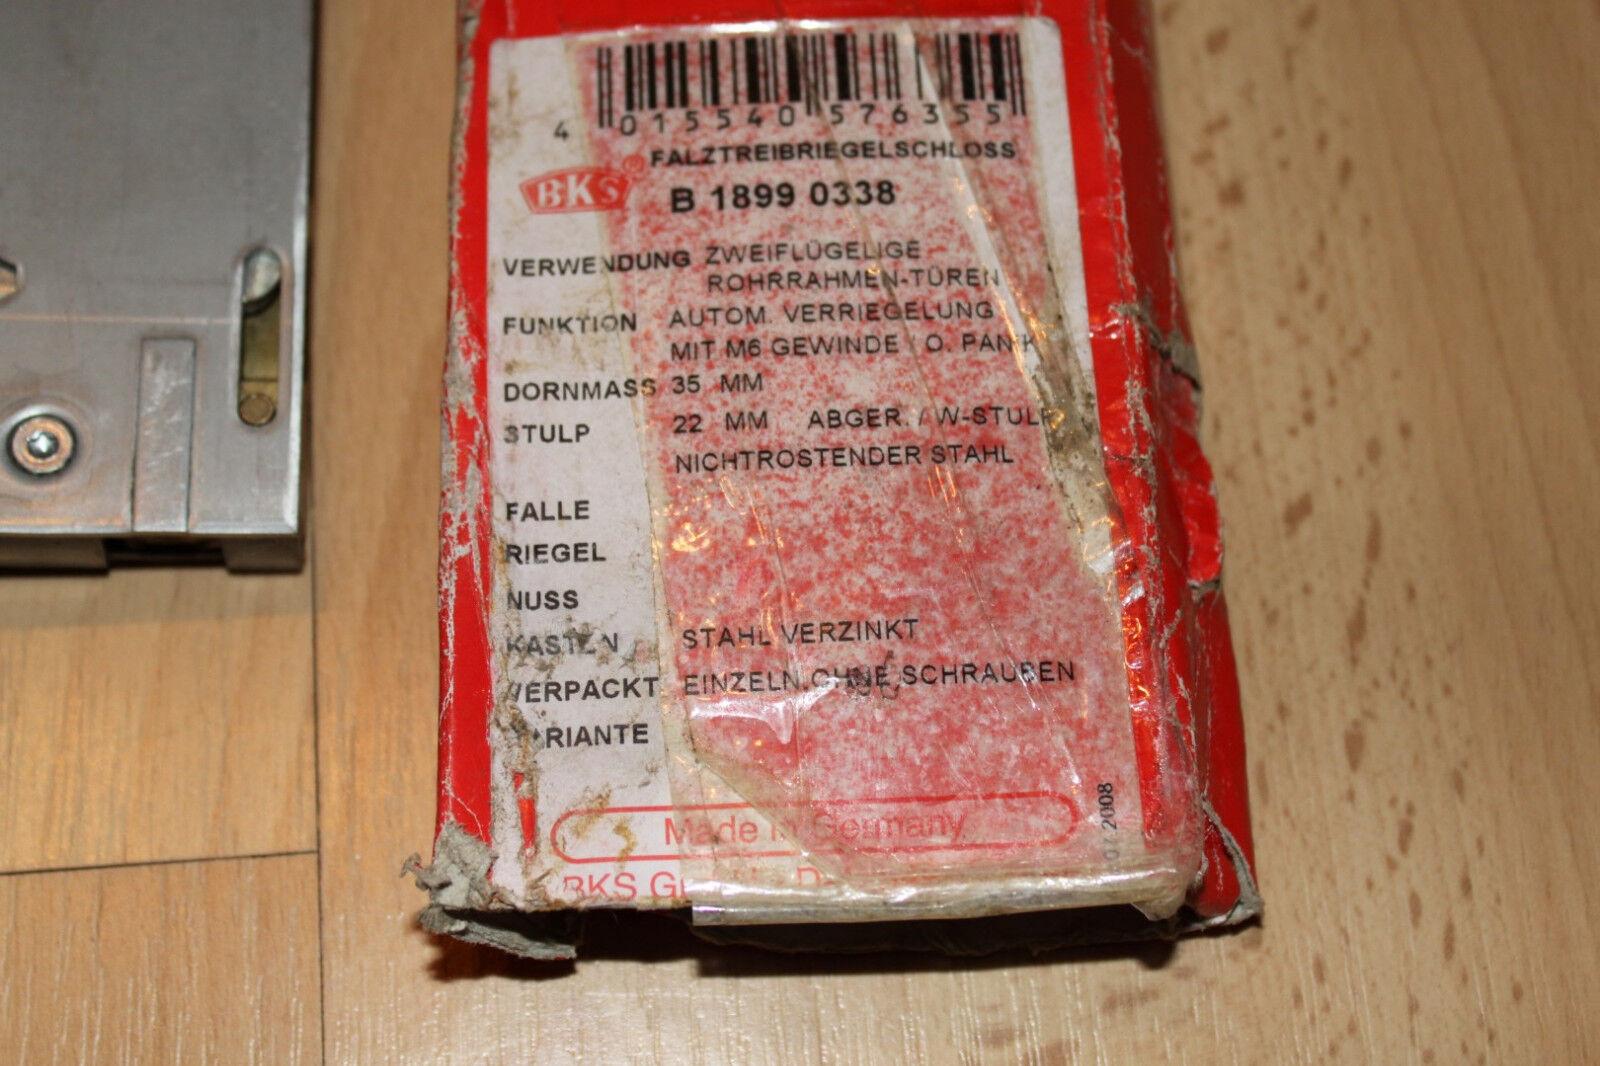 BKS Falztreibriegelschloss 1899 0338, Dornmass Dornmass Dornmass 35 mm, DIN L  | Am praktischsten  | Das hochwertigste Material  | Meistverkaufte weltweit  | Sonderpreis  045f76